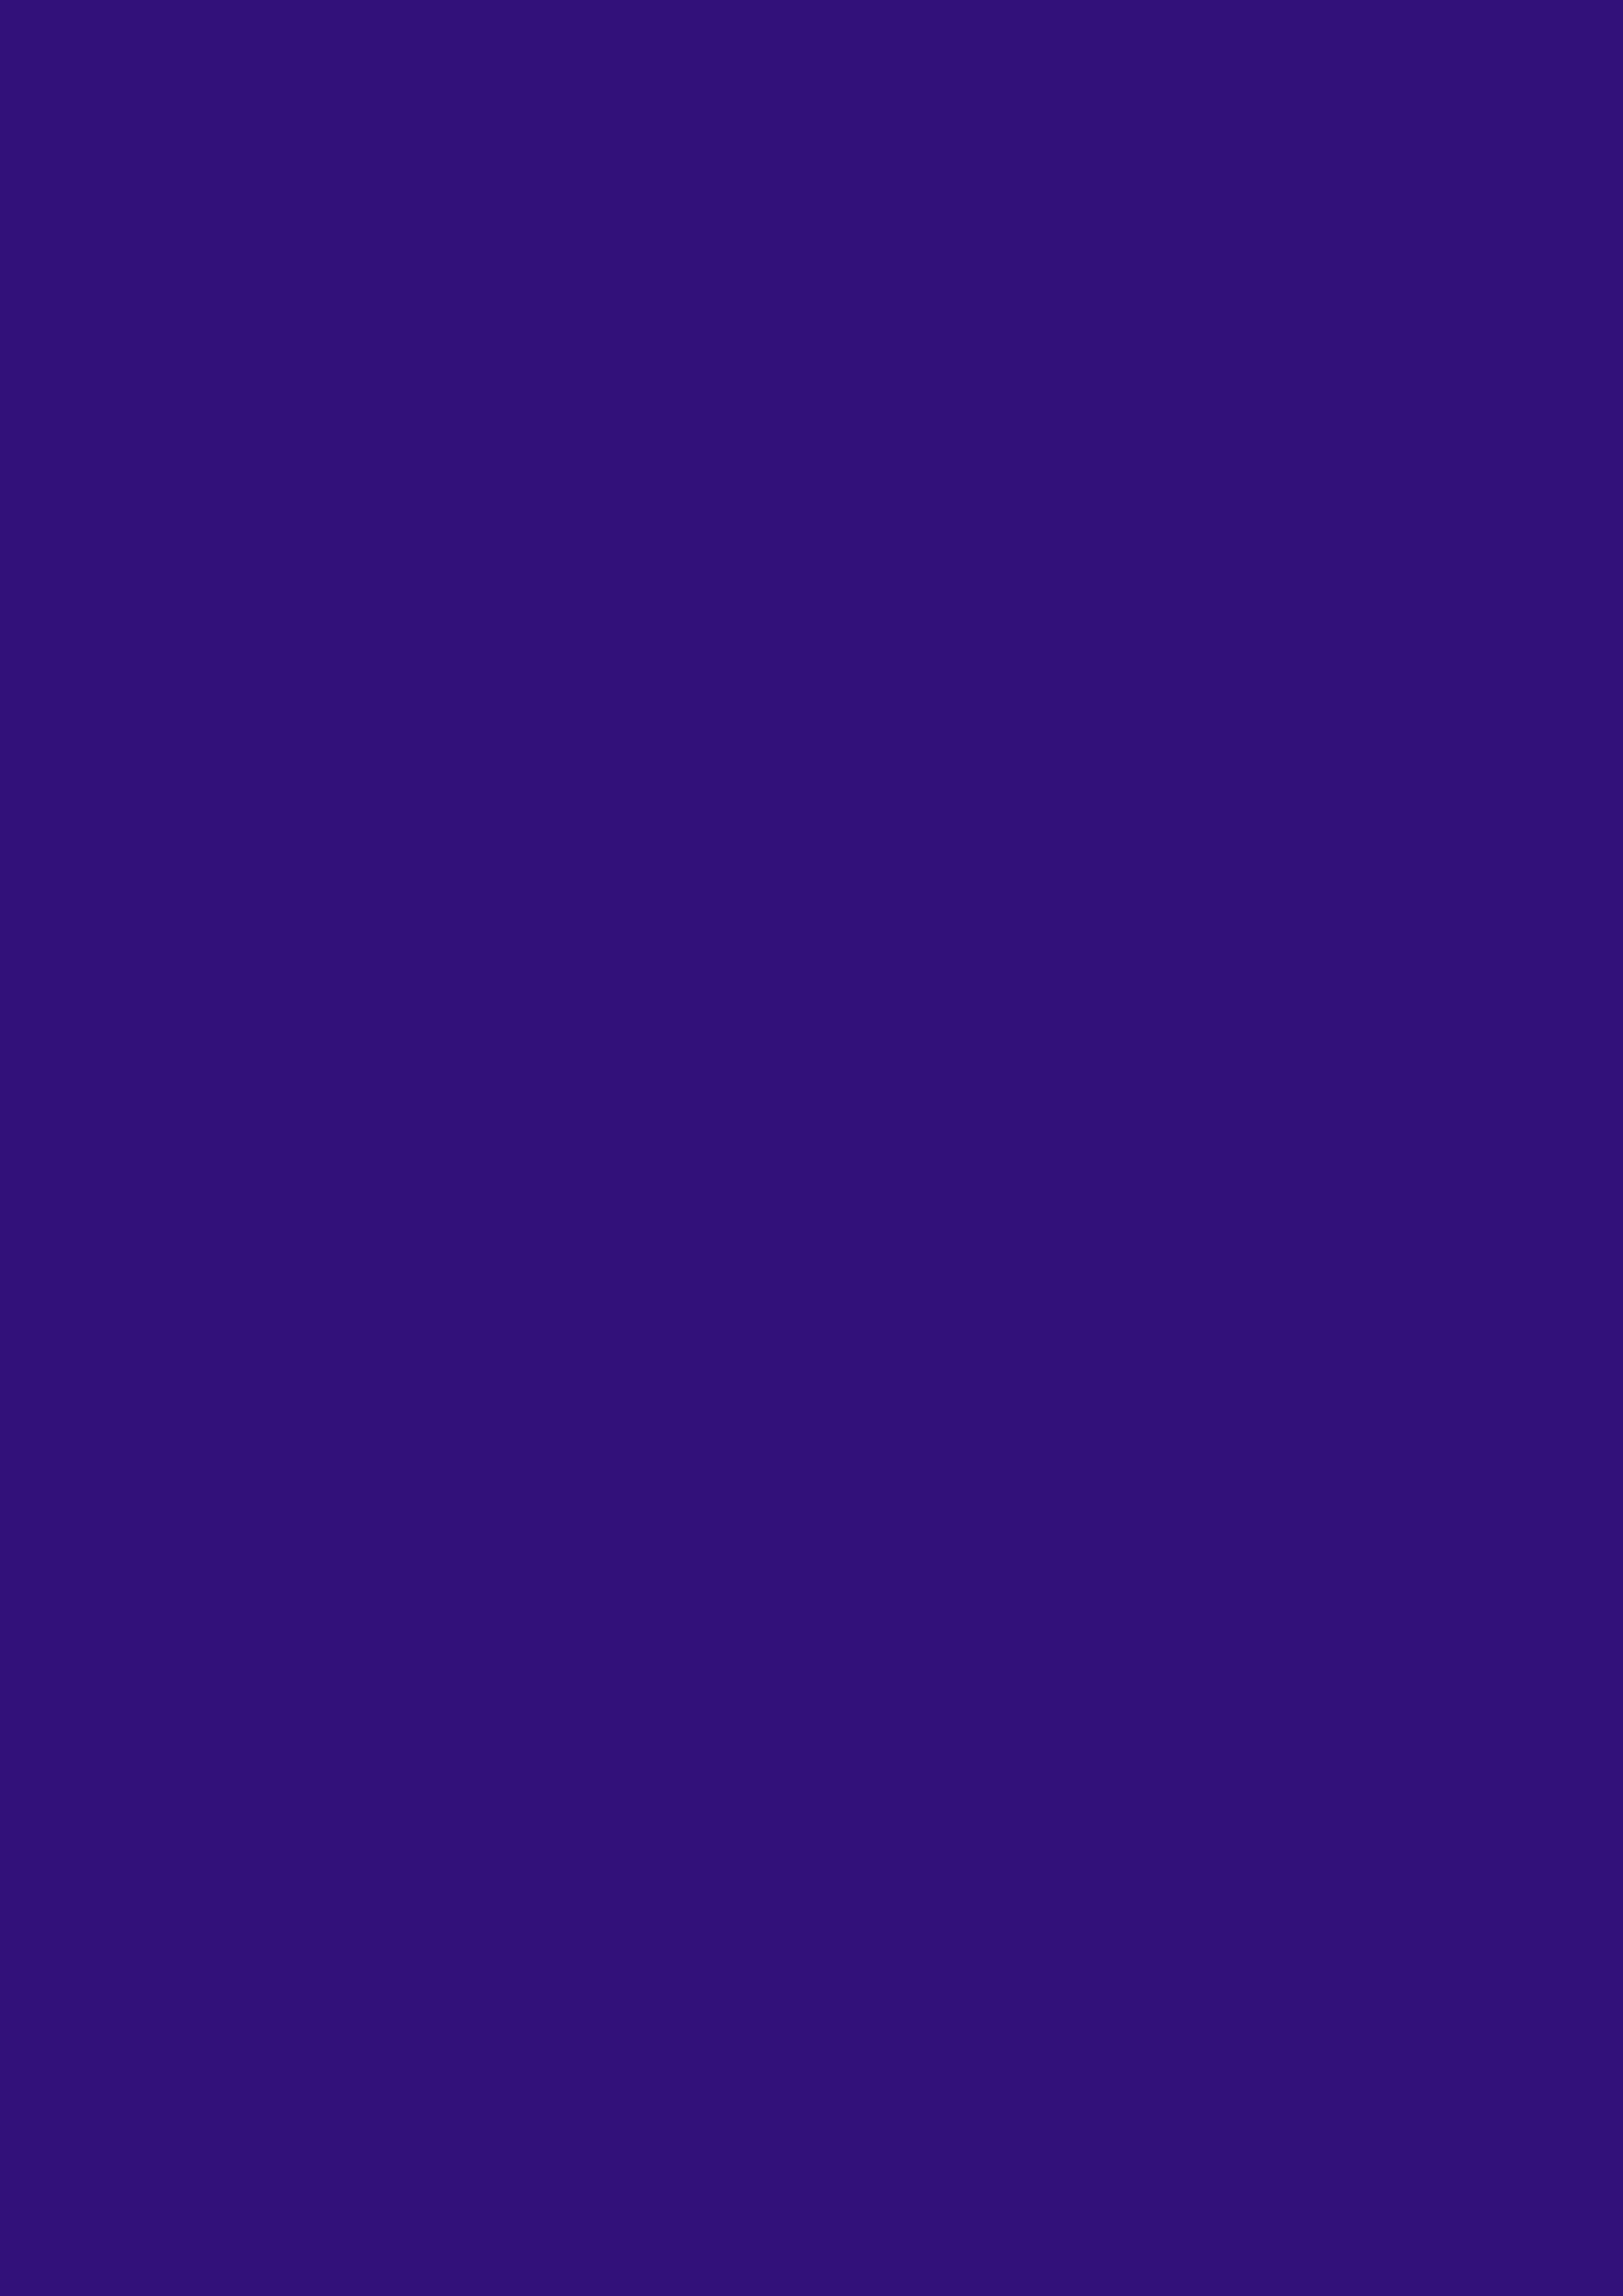 2480x3508 Persian Indigo Solid Color Background